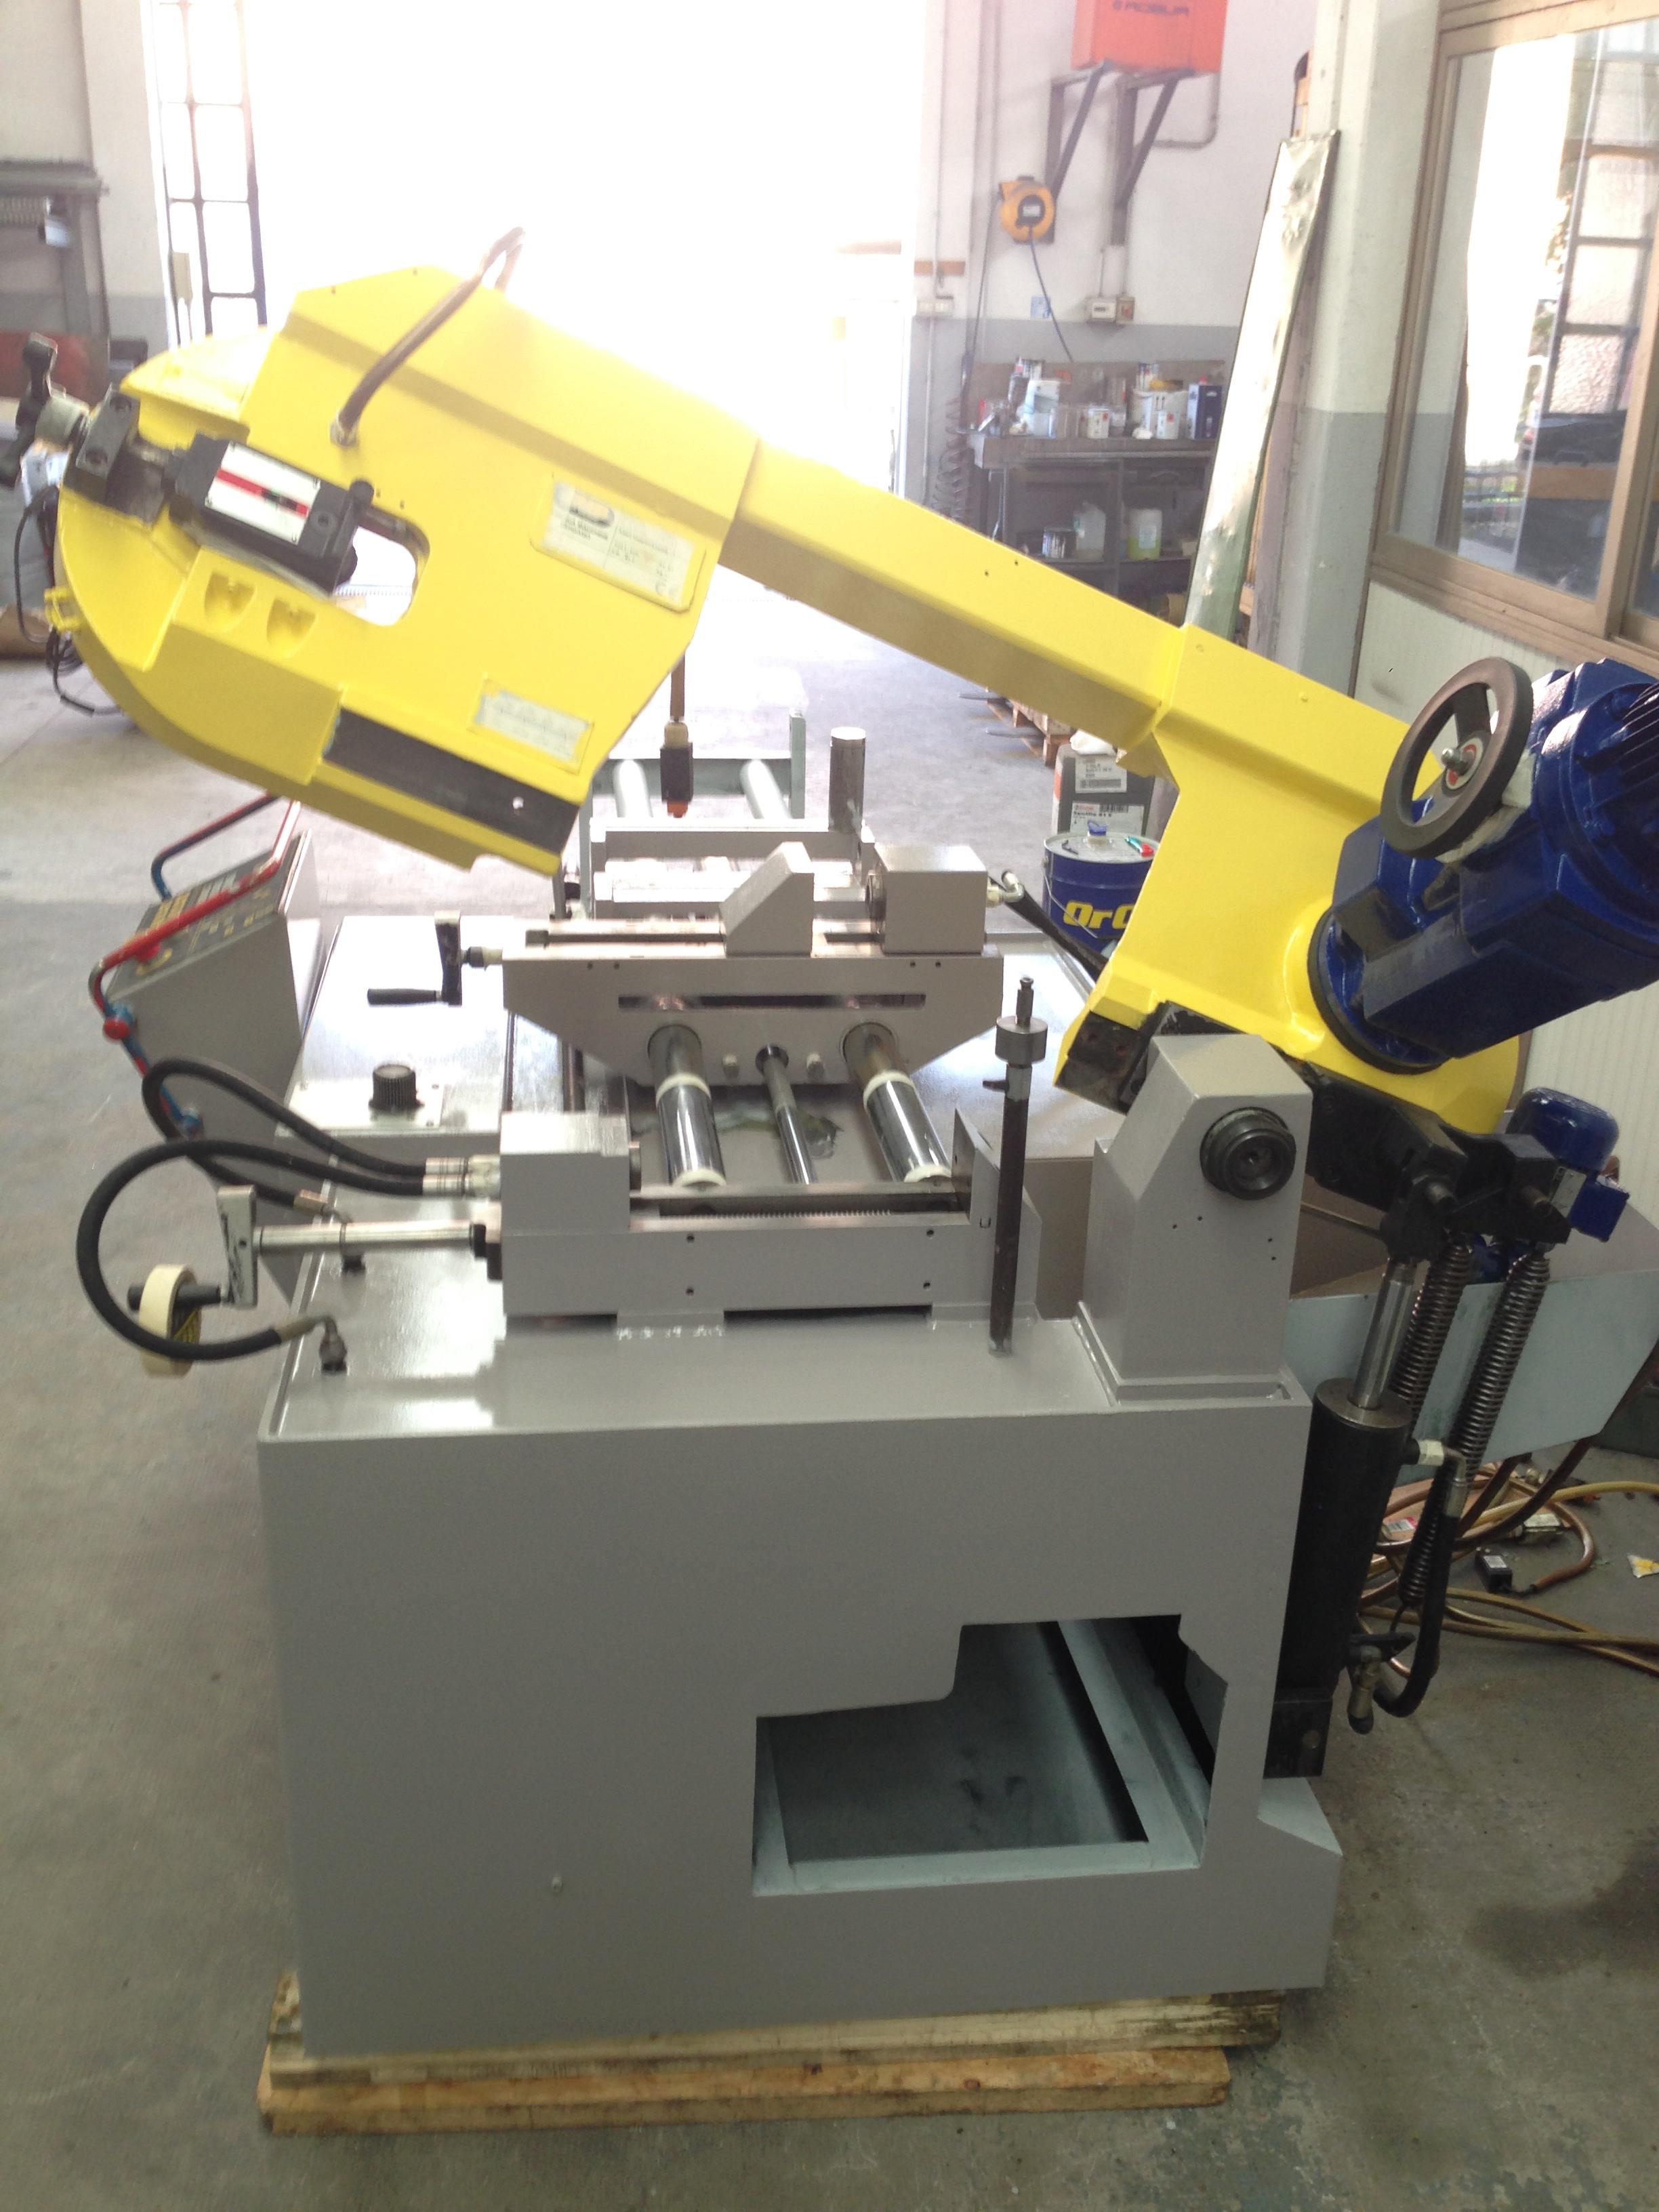 Sierra de cinta para metal fmb zeus maquinas de segunda - Sierra de cinta para metal ...